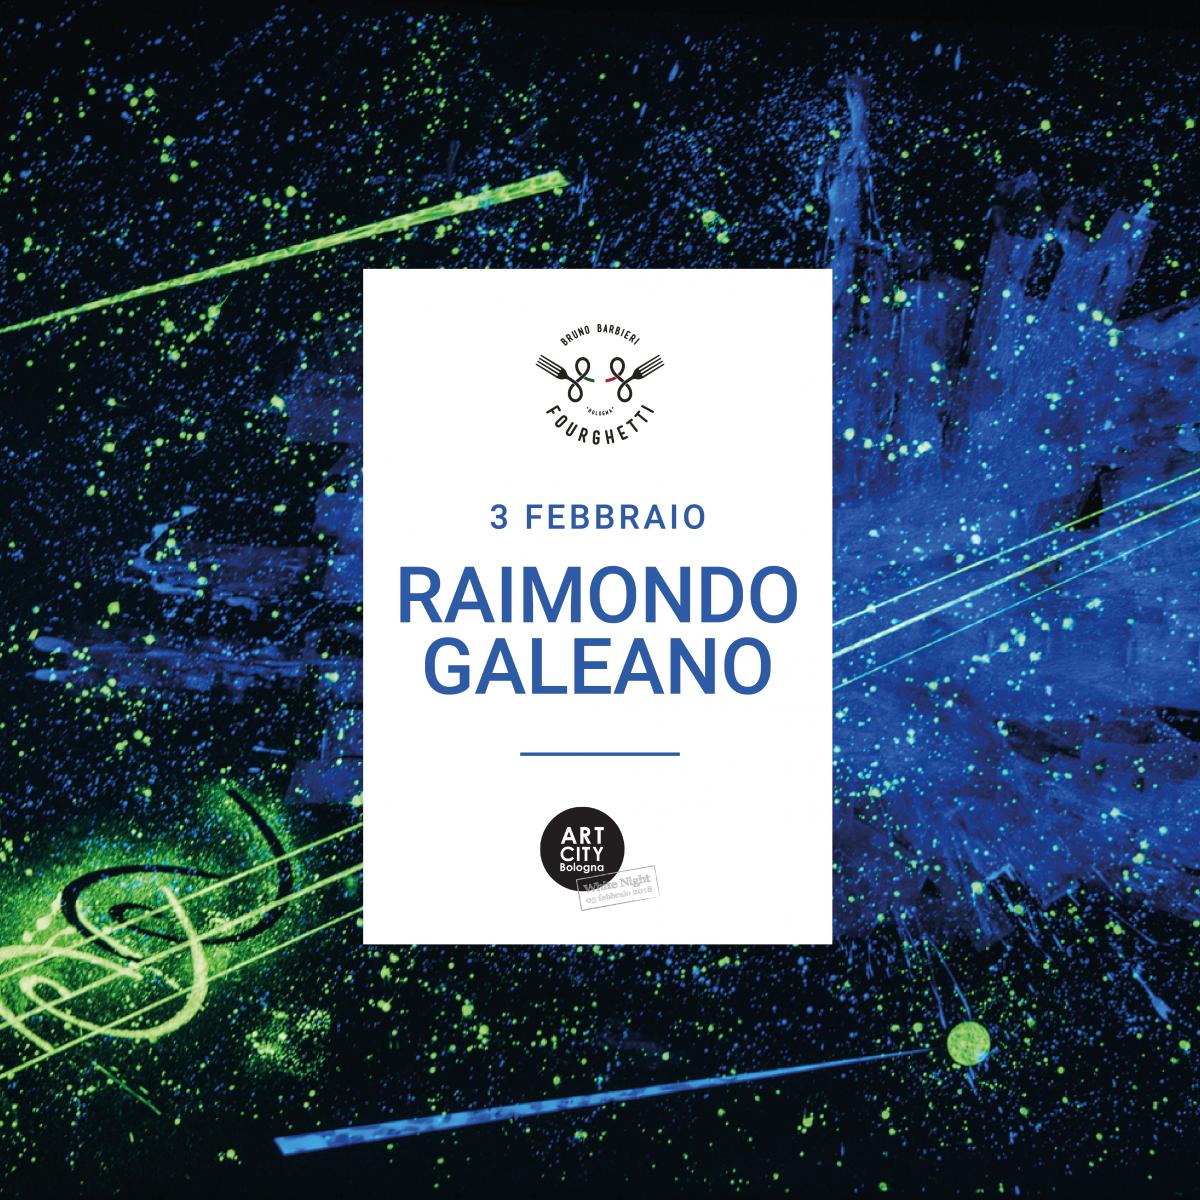 ART CITY BOLOGNA: IL FOURGHETTI OSPITA RAIMONDO GALEANO